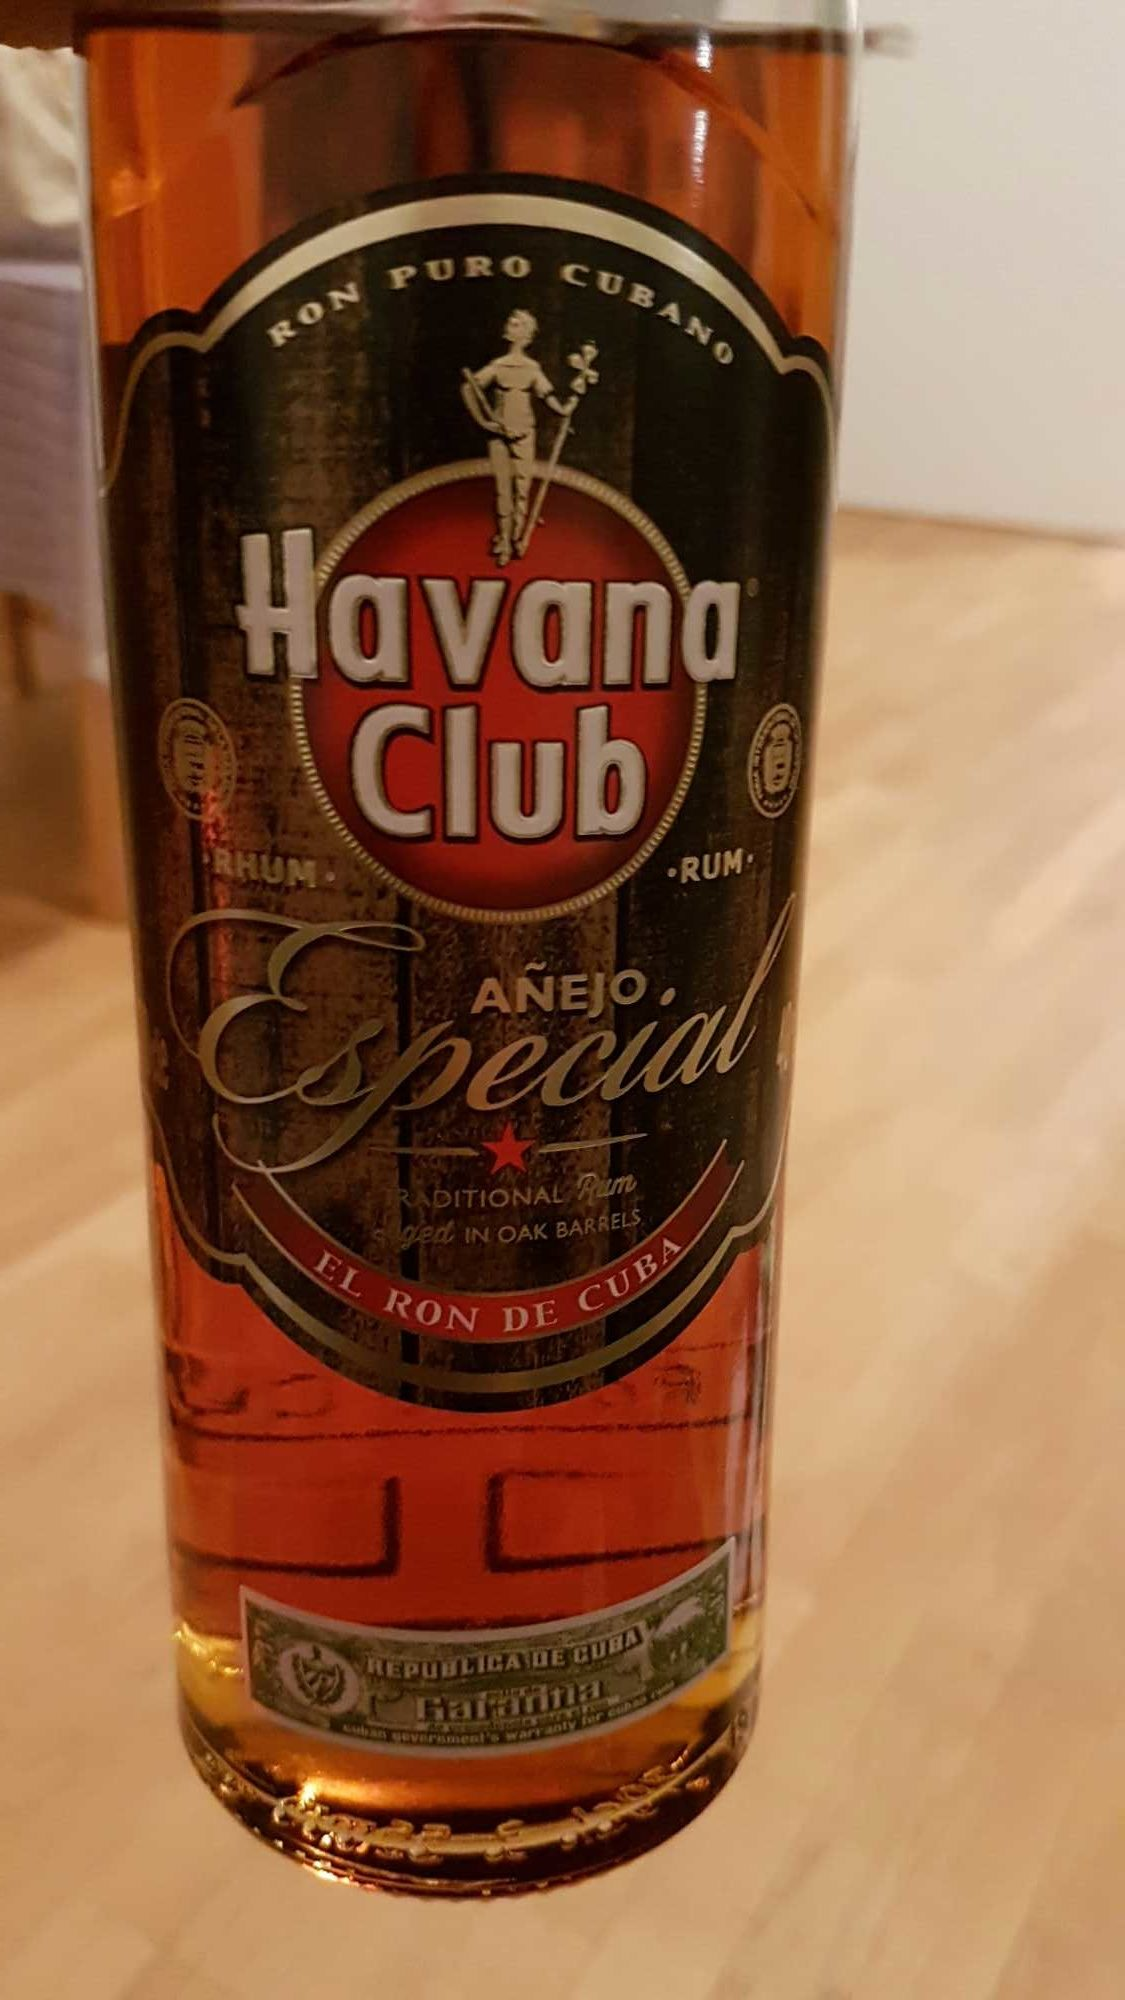 Havana Club Añejo Especial - Product - fr